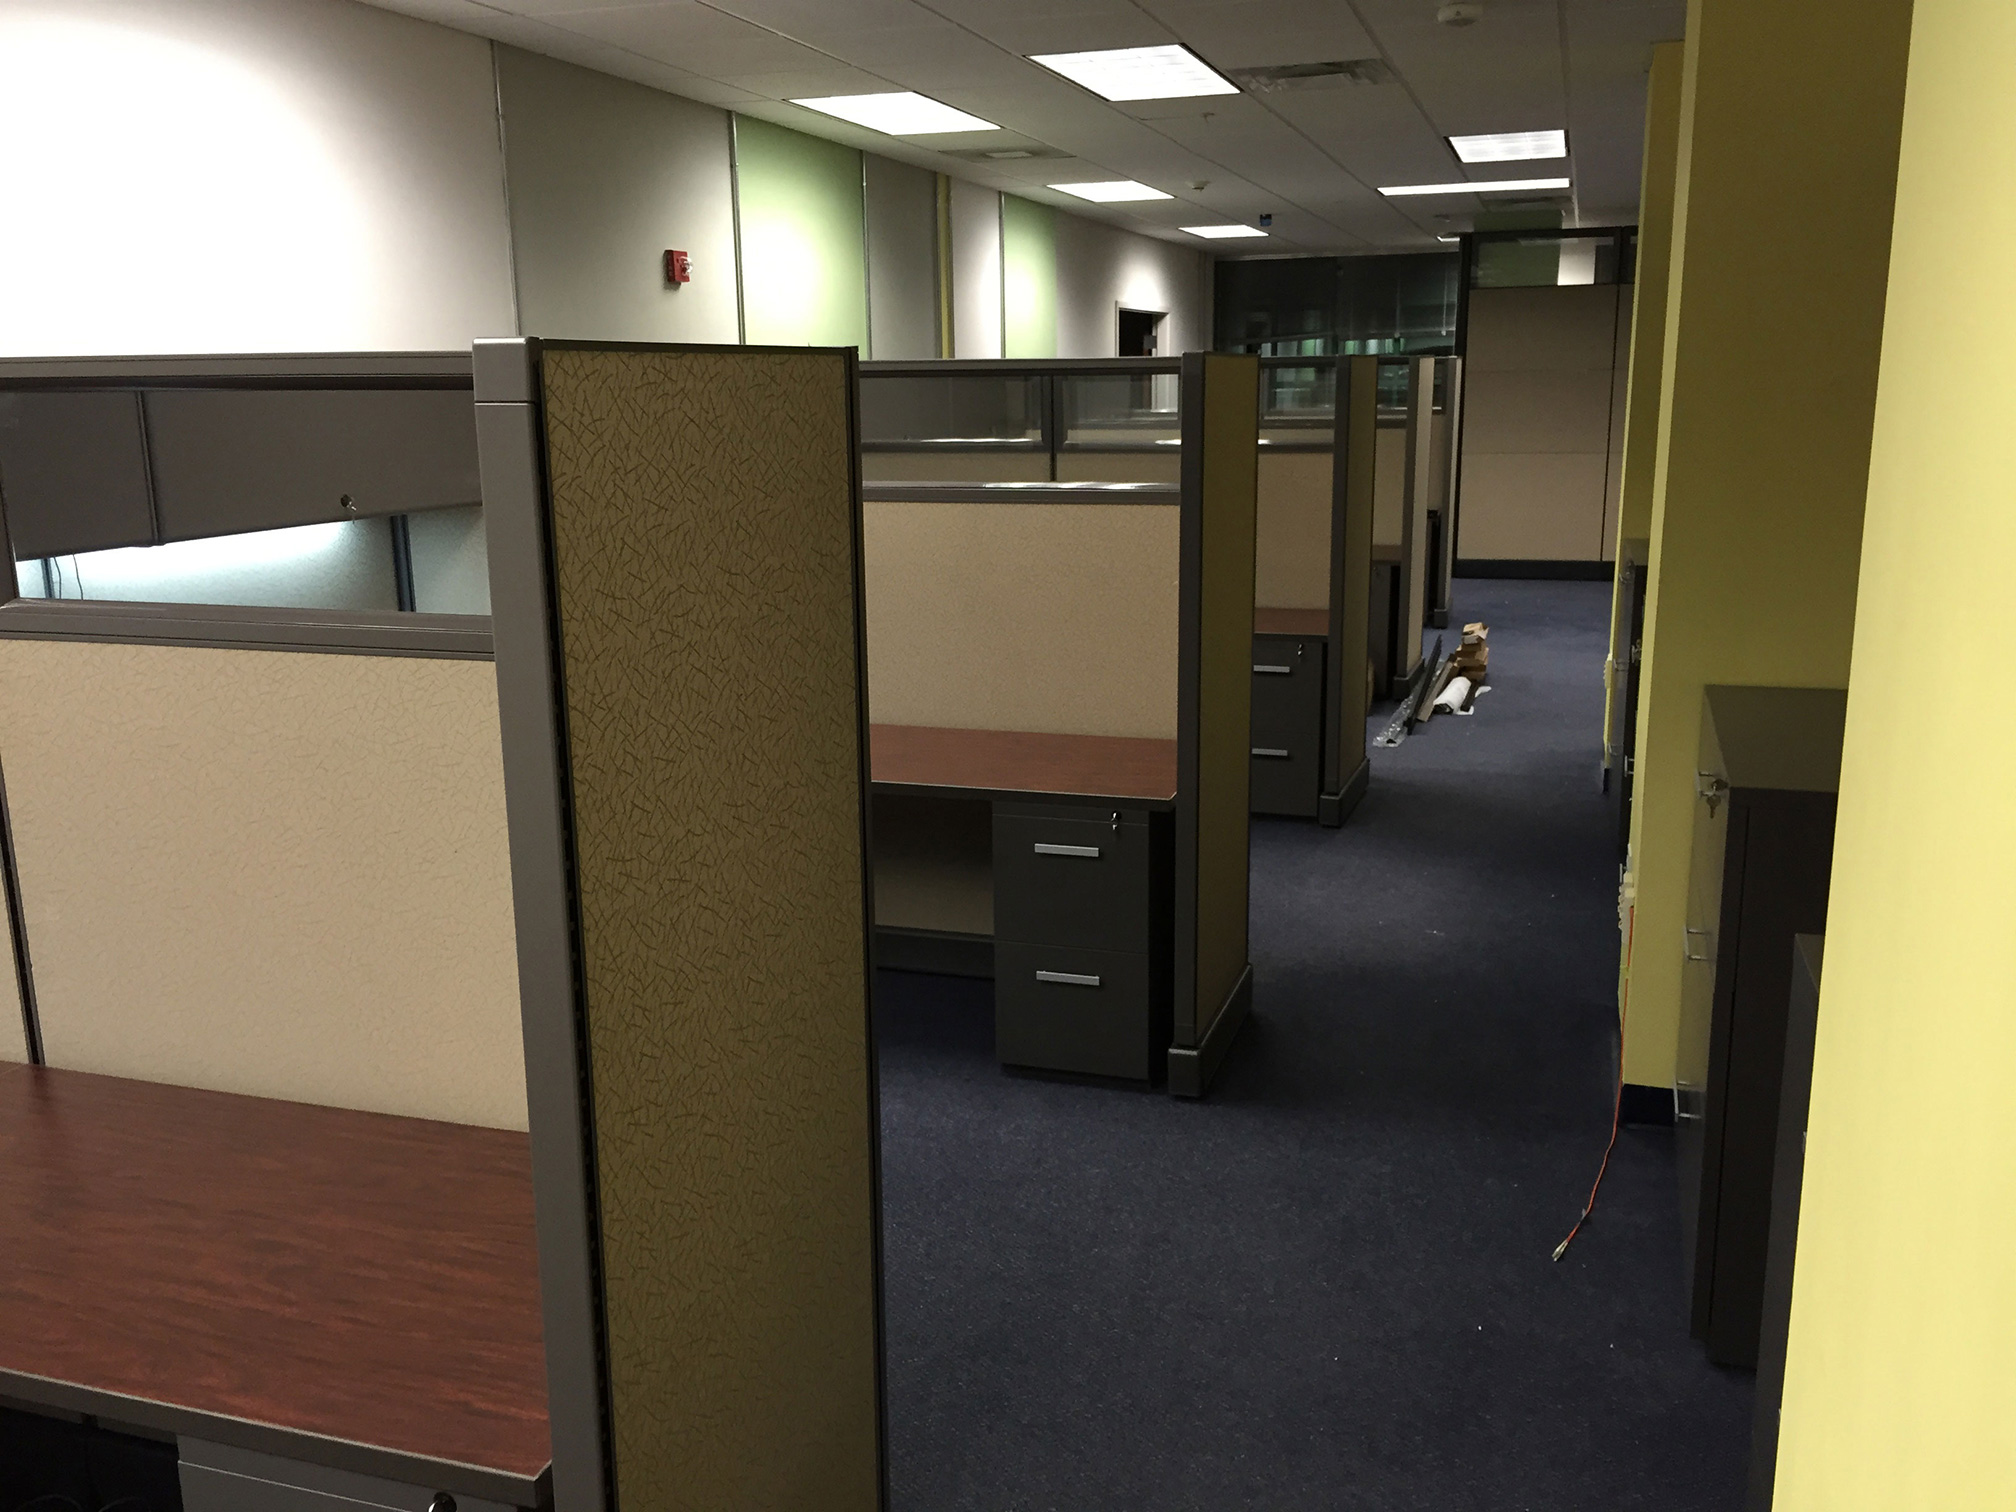 office-cubicles-for-sale-in-bradenton-florida-3-3.jpg